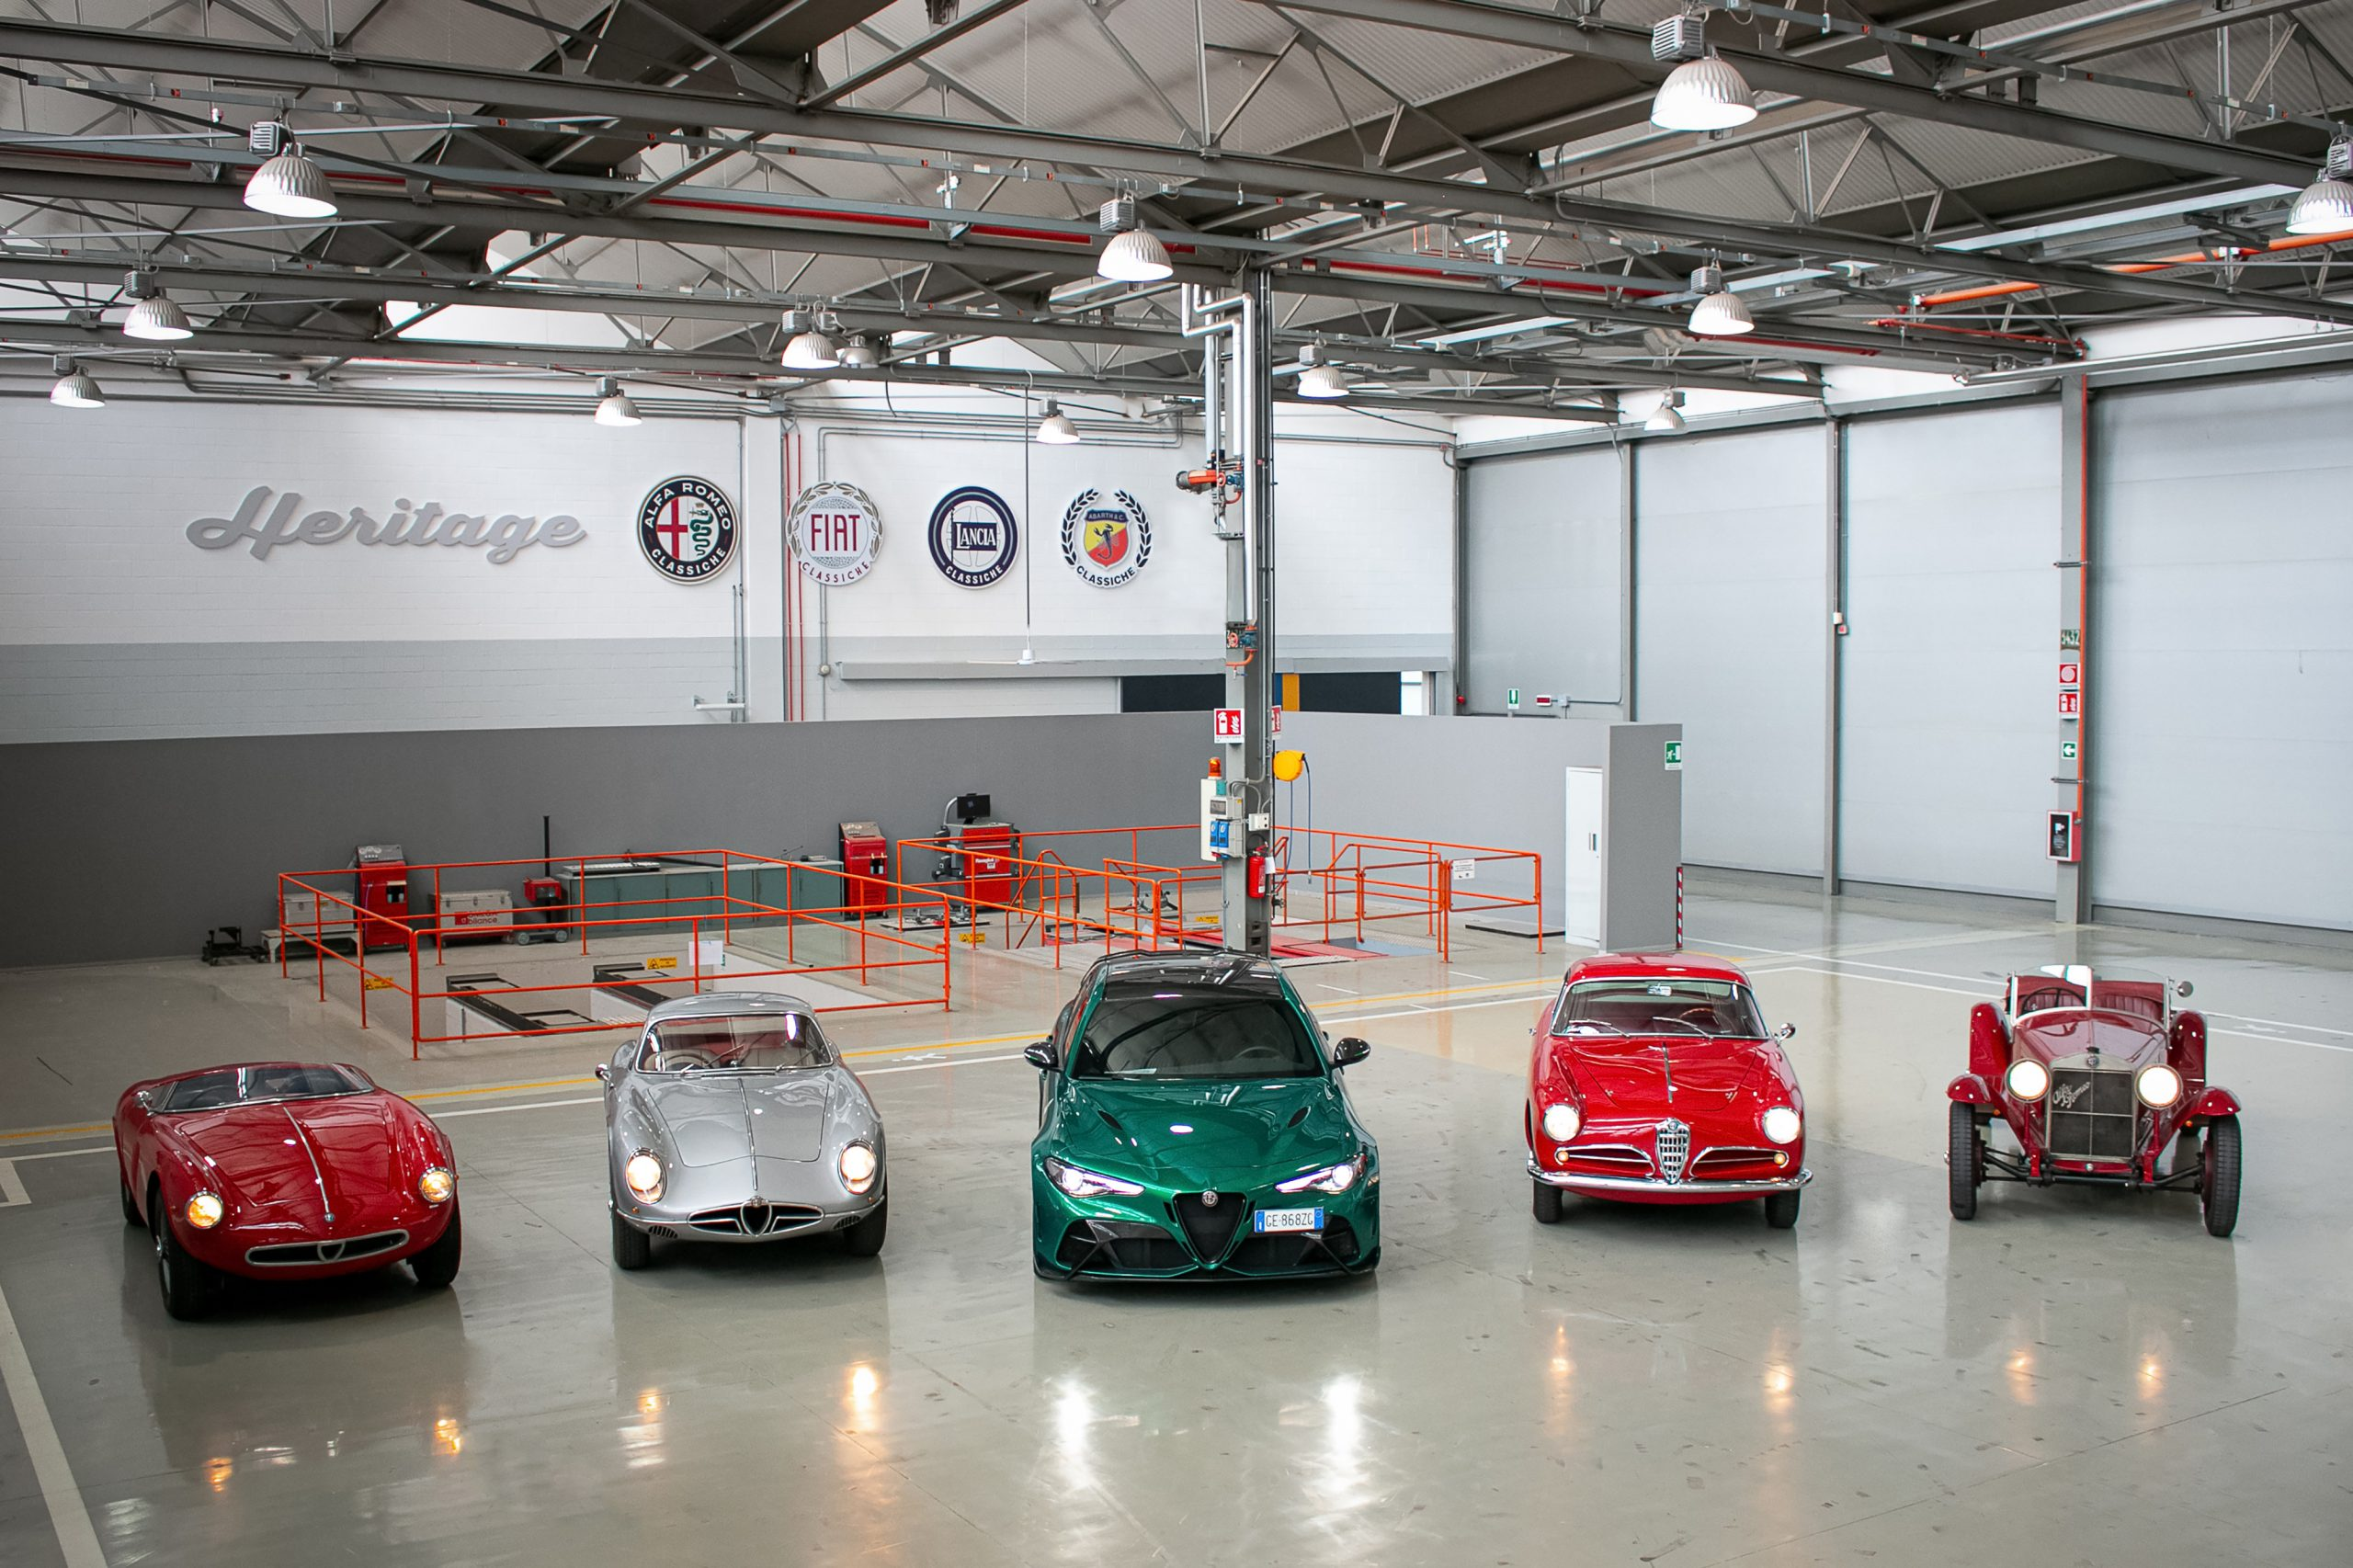 "01 Alfa Romeo and Heritage at the 2021 1000 Miglia scaled H Alfa Romeo ετοιμάζεται για το 39ο ιστορικό ""1000 Miglia"" 1000 Miglia, Alfa, alfa romeo, Alfa Romeo Giulia, Alfa Romeo Giulia GTA, Alfa Romeo Giulia GTAm, Giulia, Mille Miglia, zblog, ειδήσεις, Νέα"